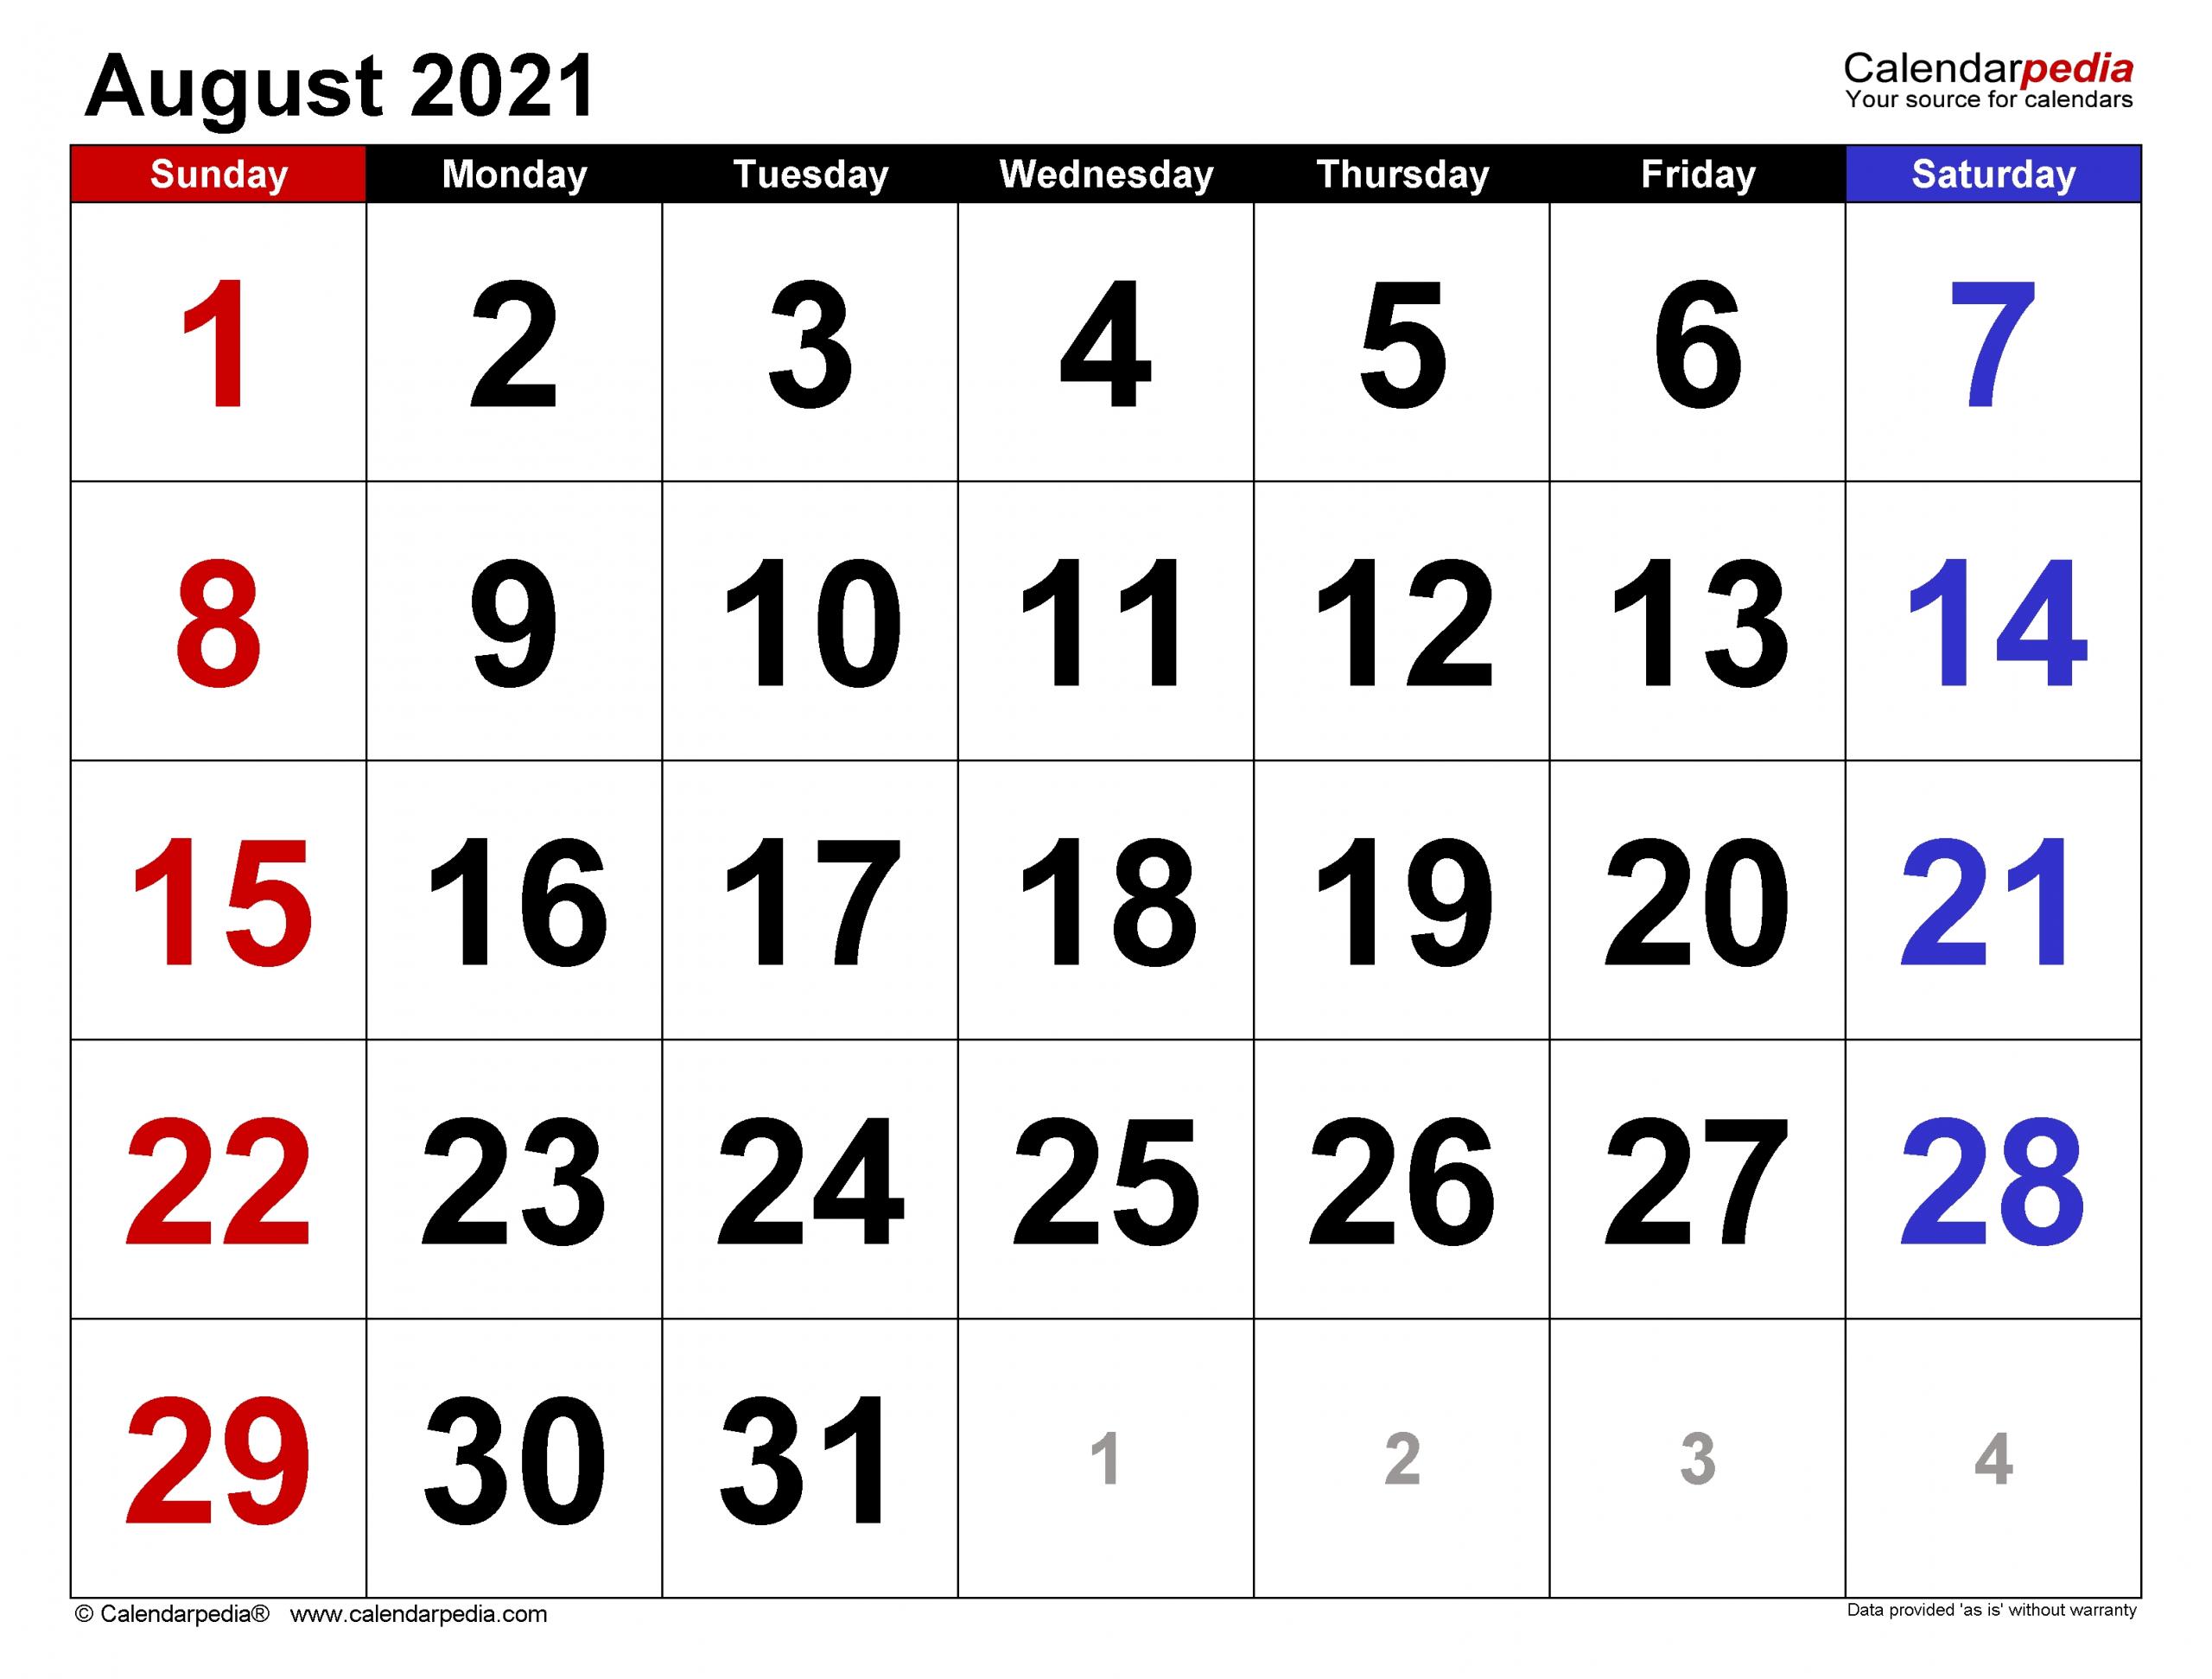 Get Blank August 2021 Calendar Printable